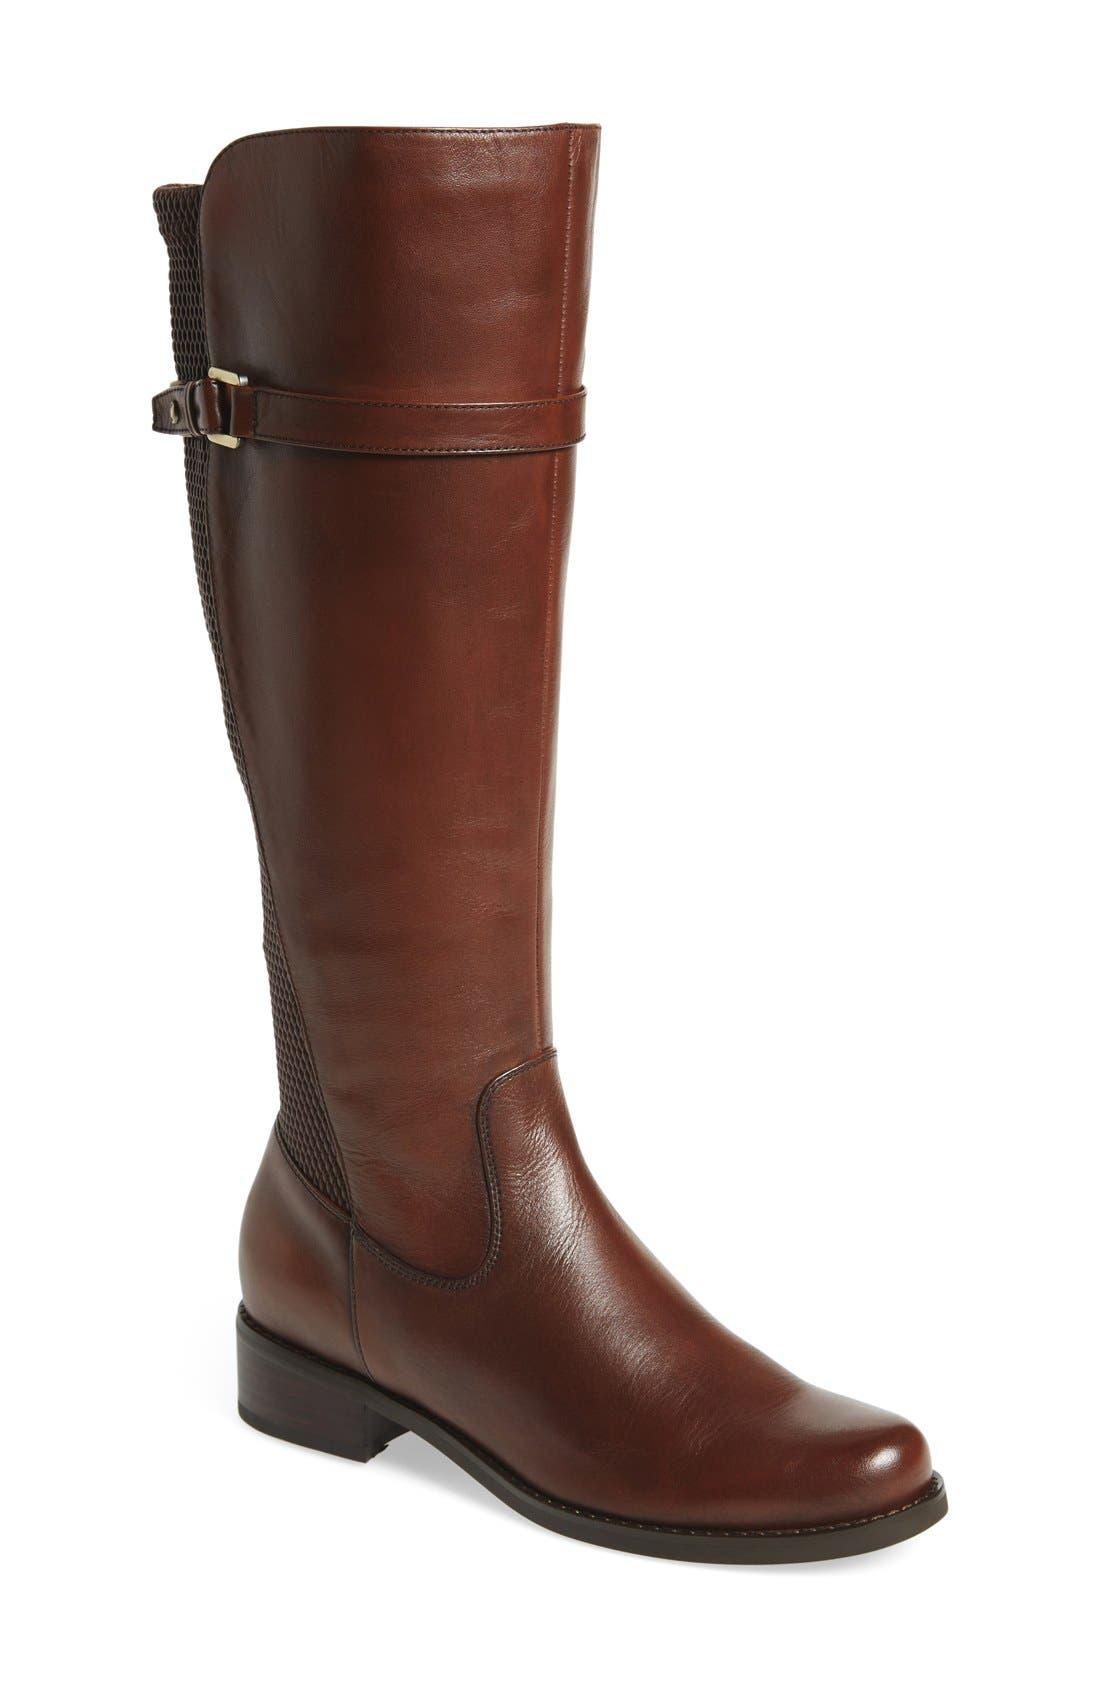 Alternate Image 1 Selected - Blondo'Viva' WaterproofTall Boot (Women)